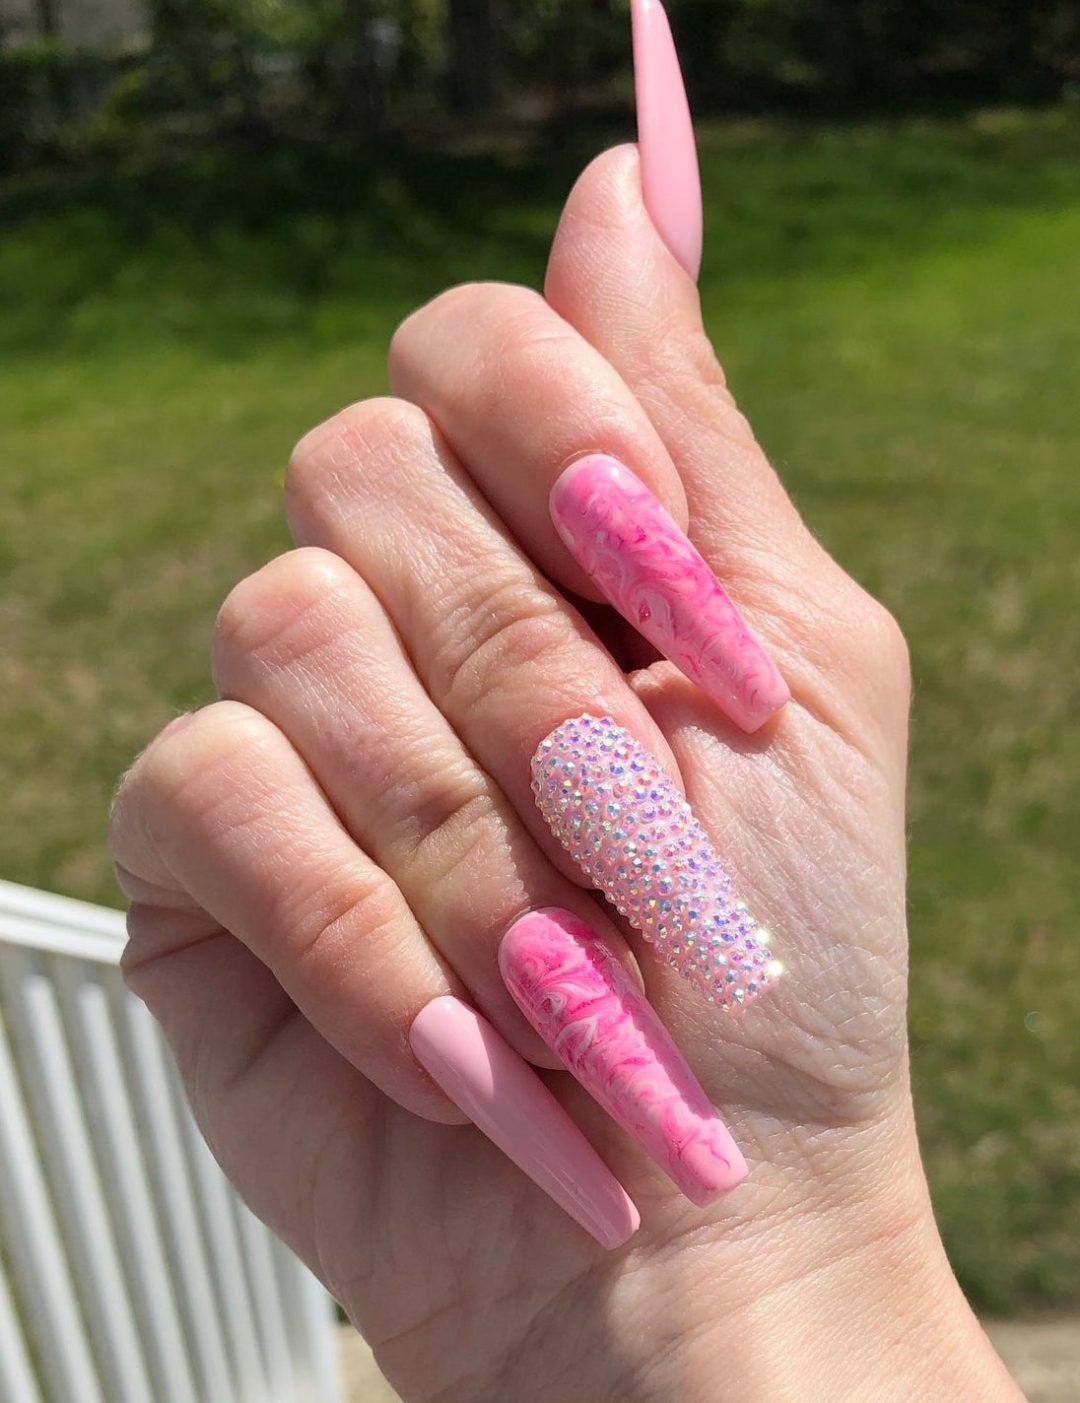 Long bubblegum pink nails with rhinestones